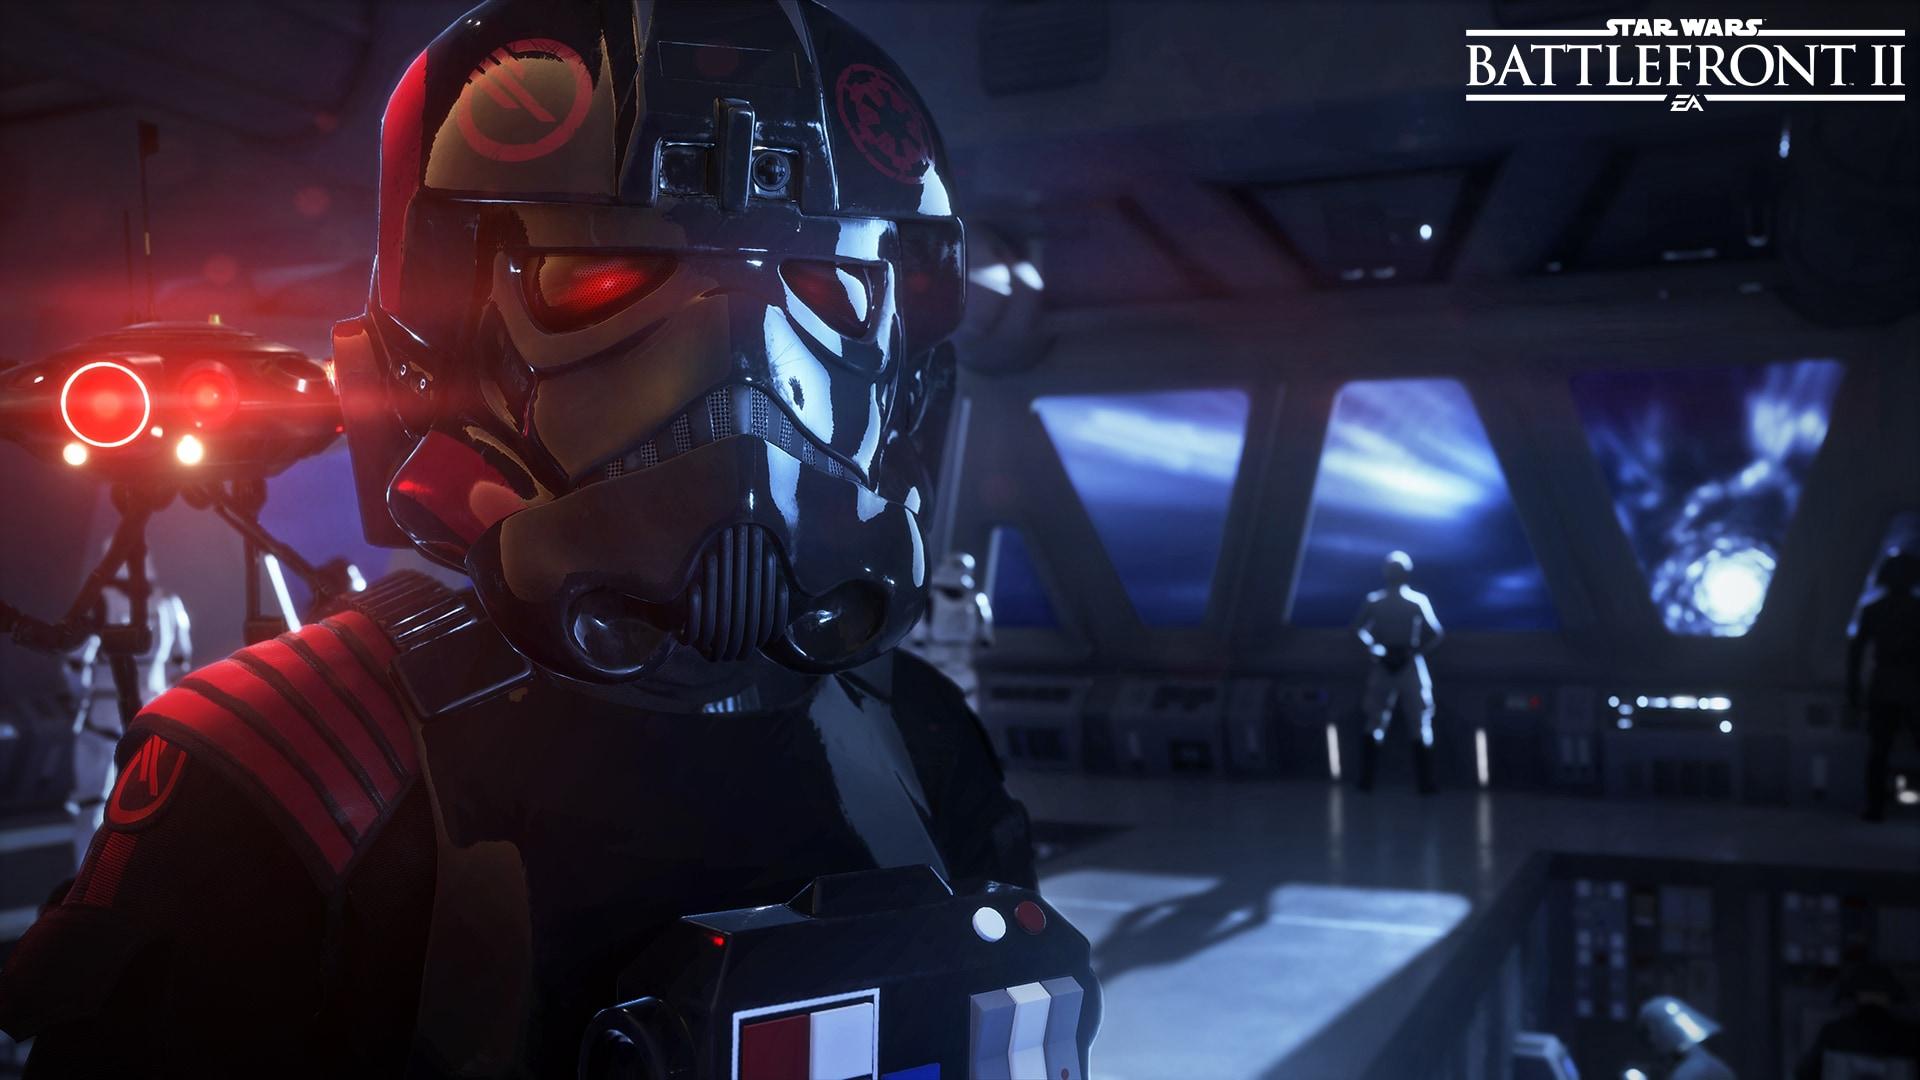 Star Wars Battlefront II Screenshot – 5